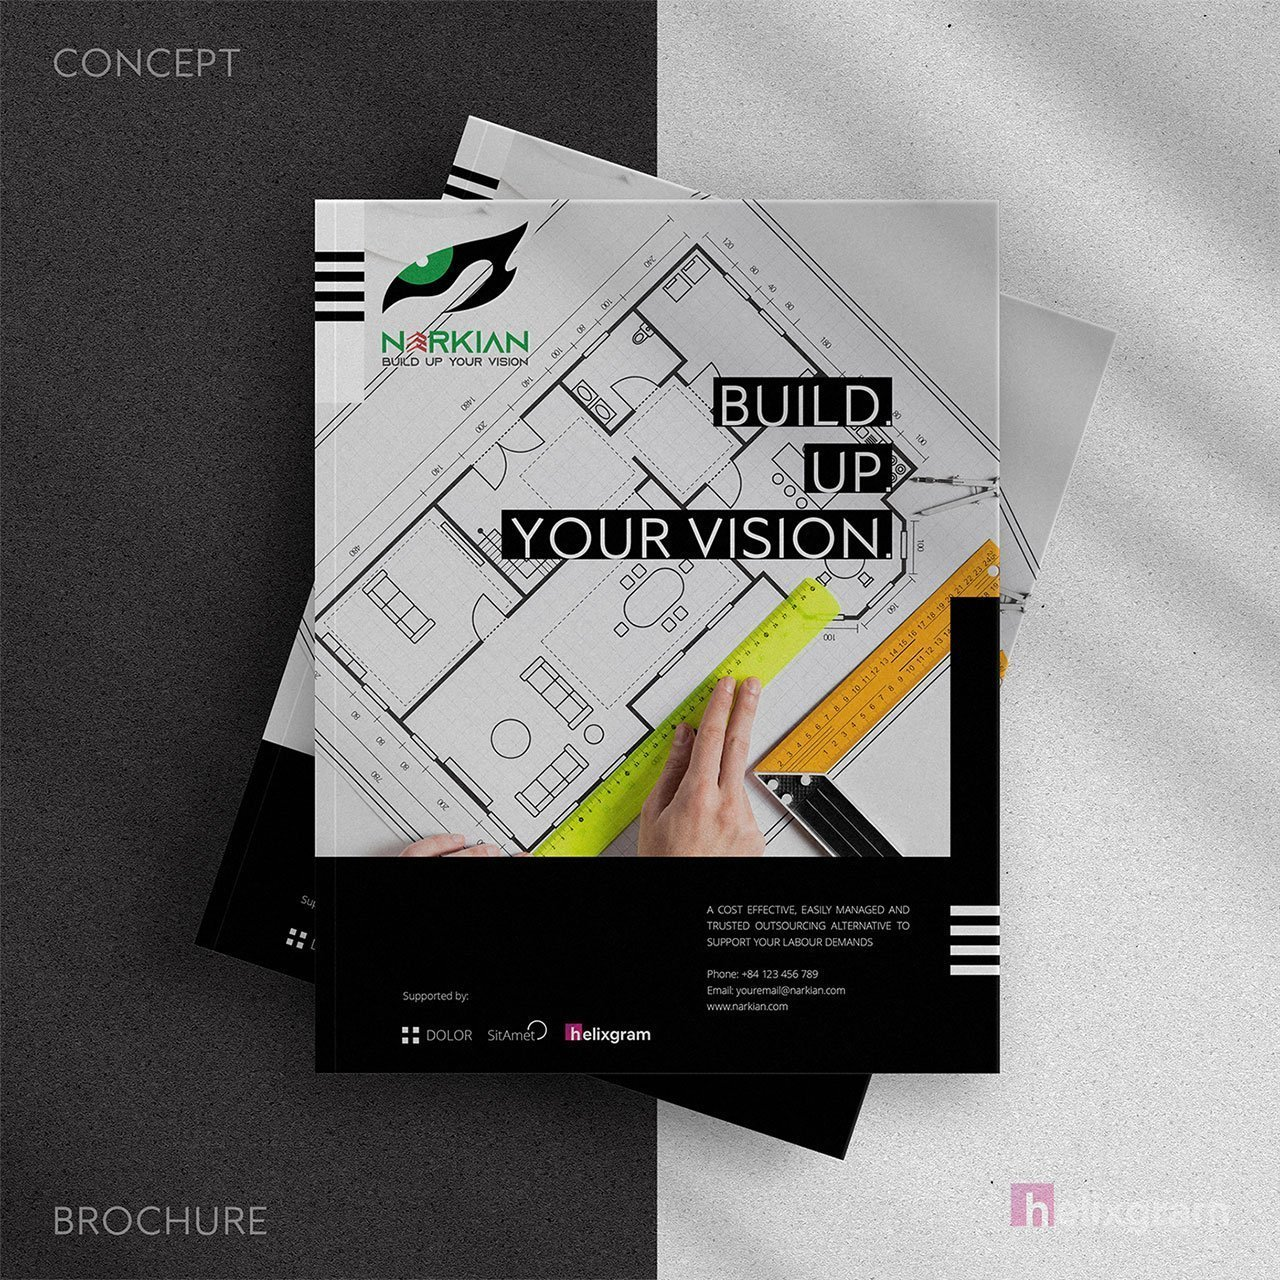 Brand-Identity-Brochure-Catalogs-Narkian-design-visual-identity-design-package-corporate-identity-design-logo-design-flyer-poster-book-cover-design-web-design-digital-advertising-Helixgram